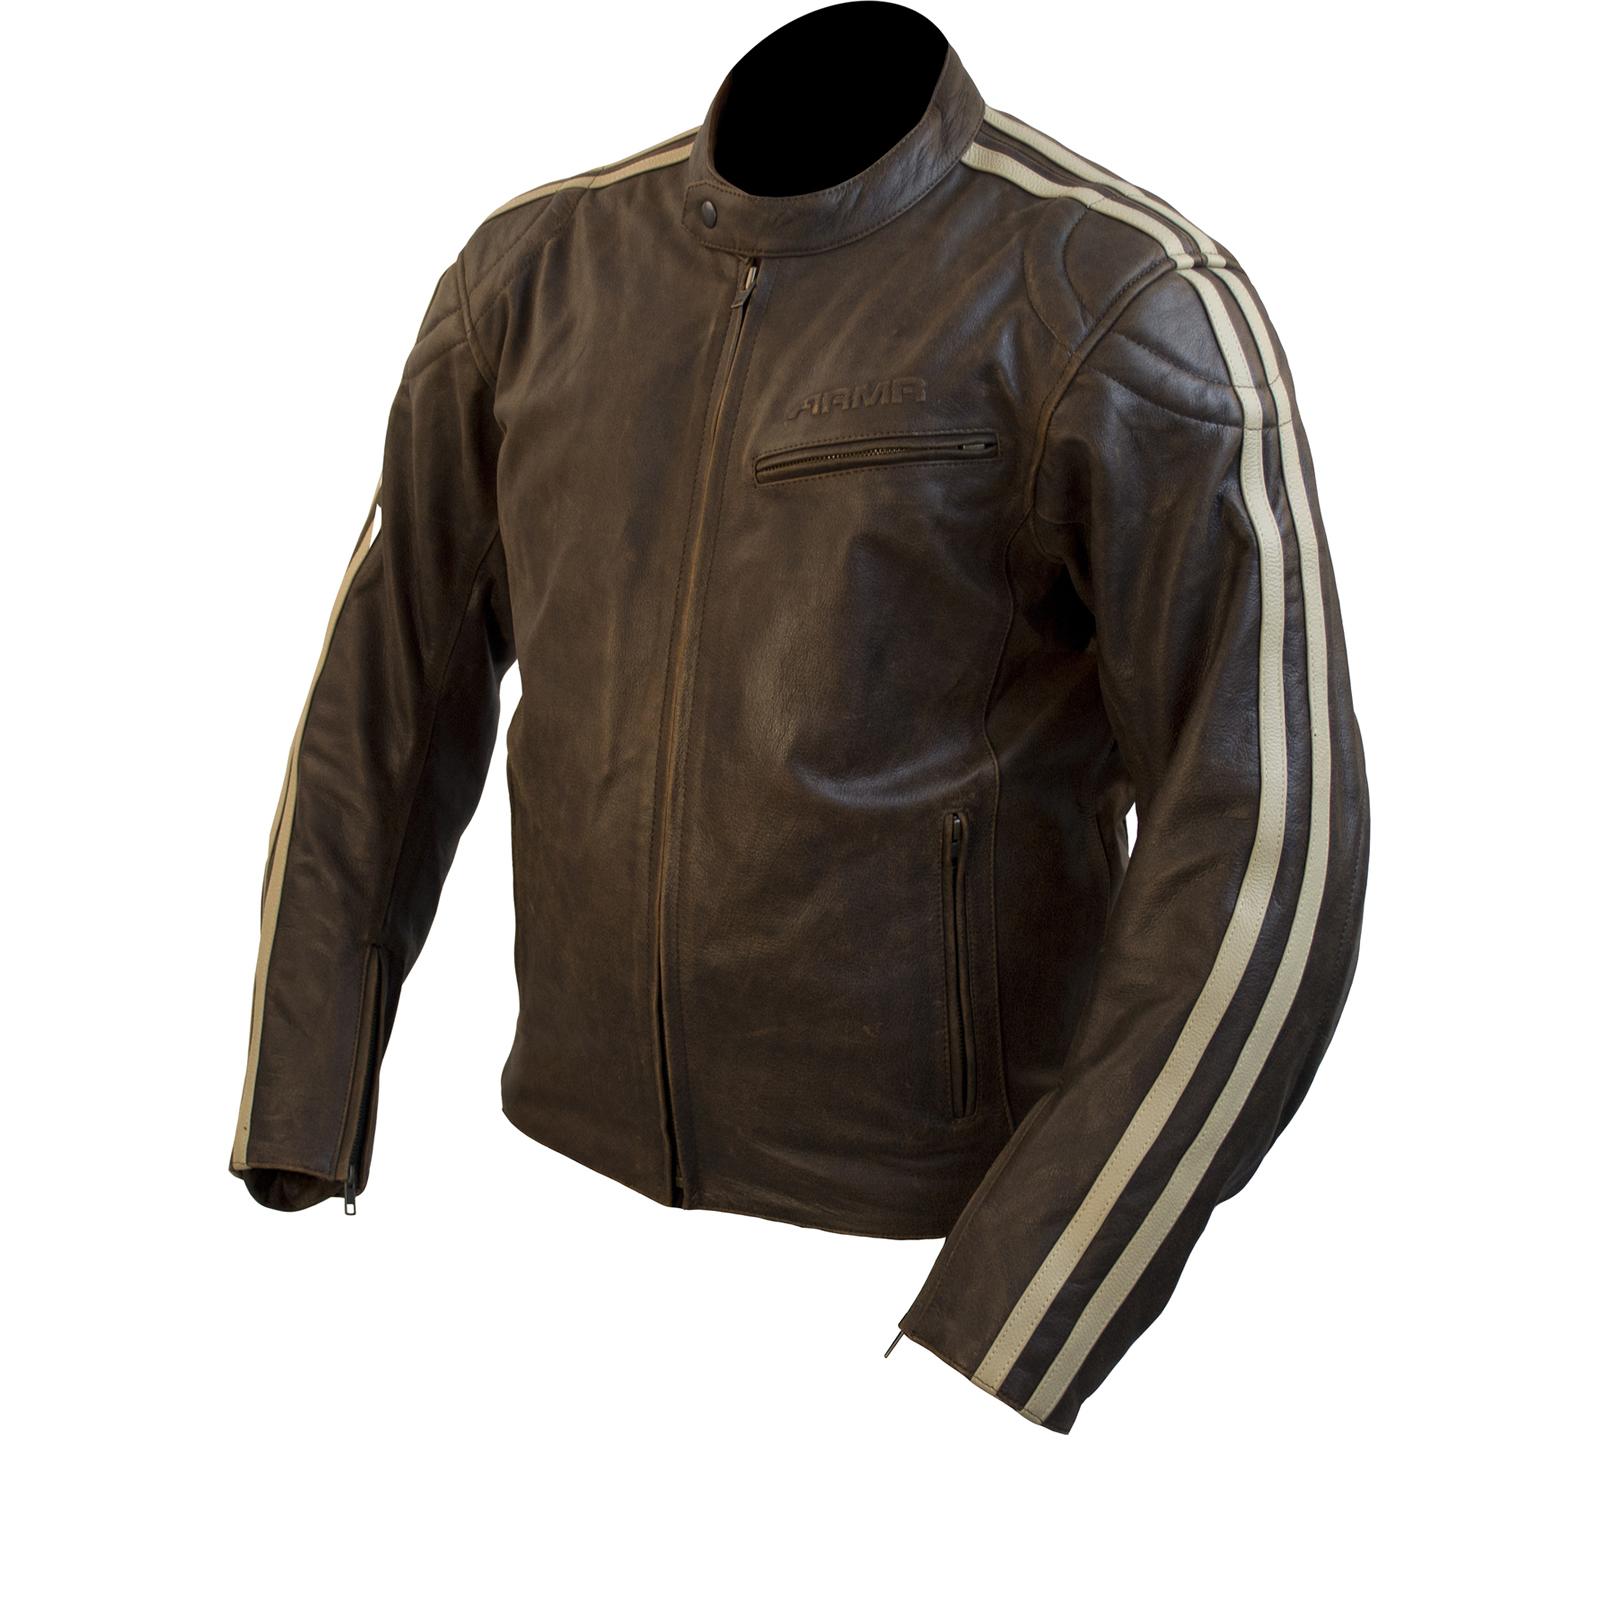 ARMR Moto Hiro Classic Leather Motorcycle Jacket